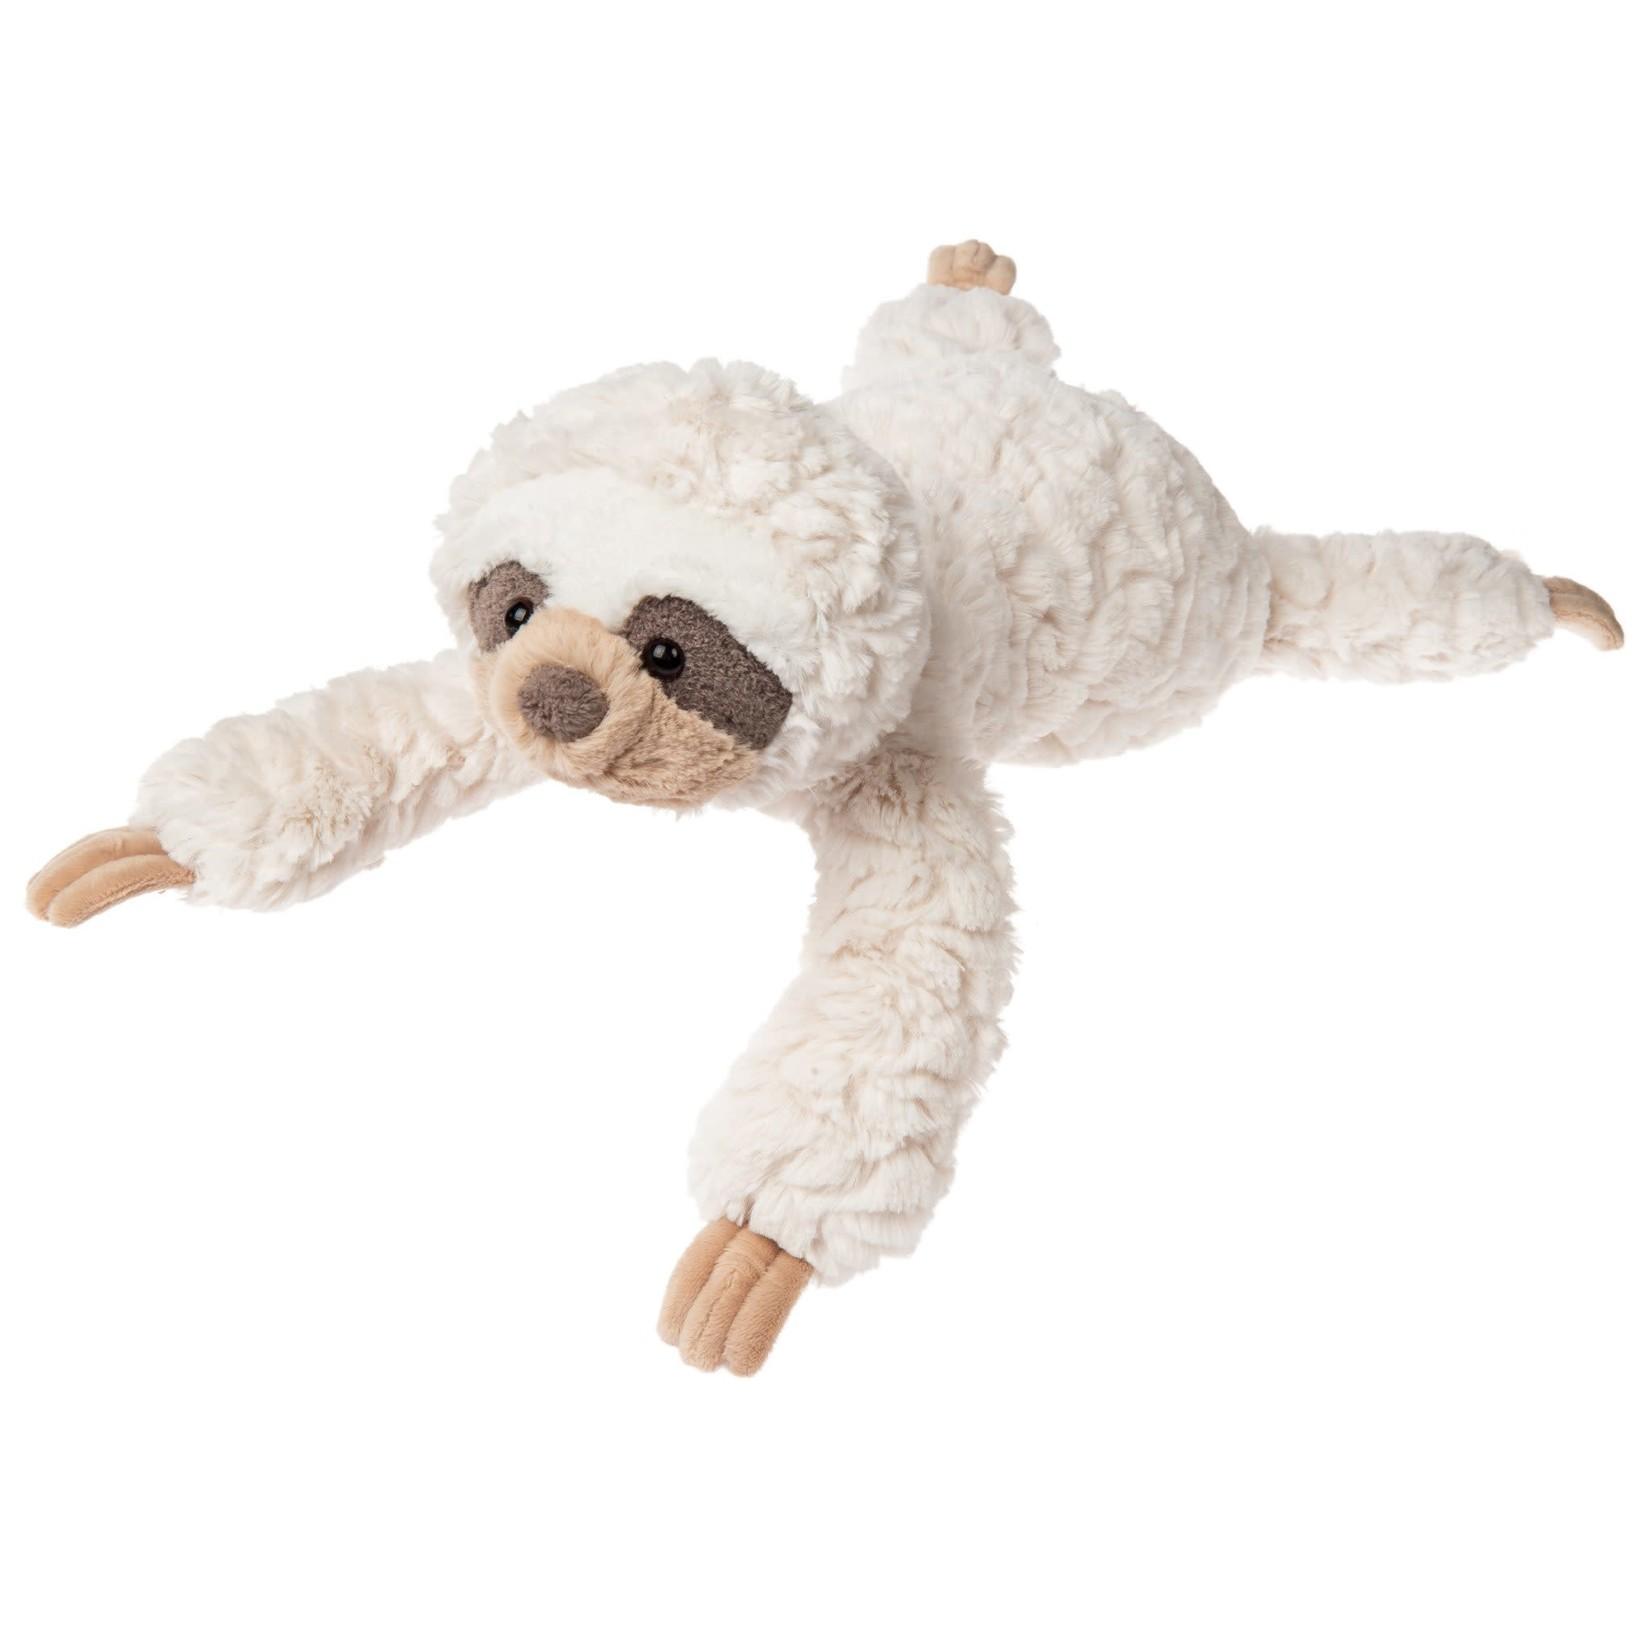 Mary Meyer Plush: Cream Rio Putty Sloth